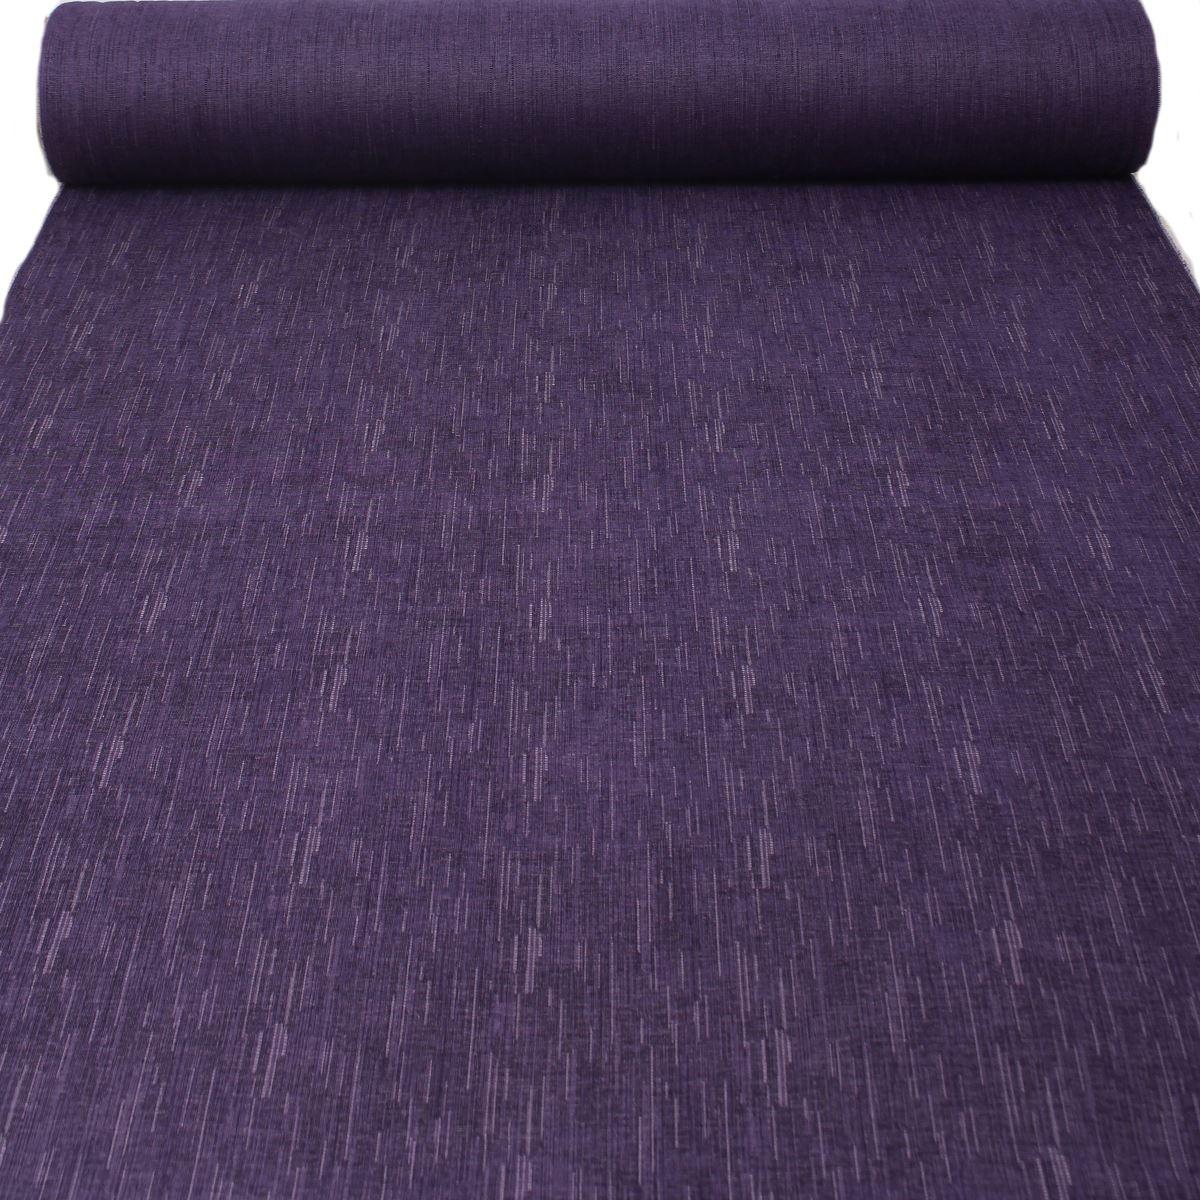 034-Chenille-034-Slubbed-Shabby-Worn-Look-Curtain-Cushion-Sofa-Upholstery-Fabric thumbnail 5